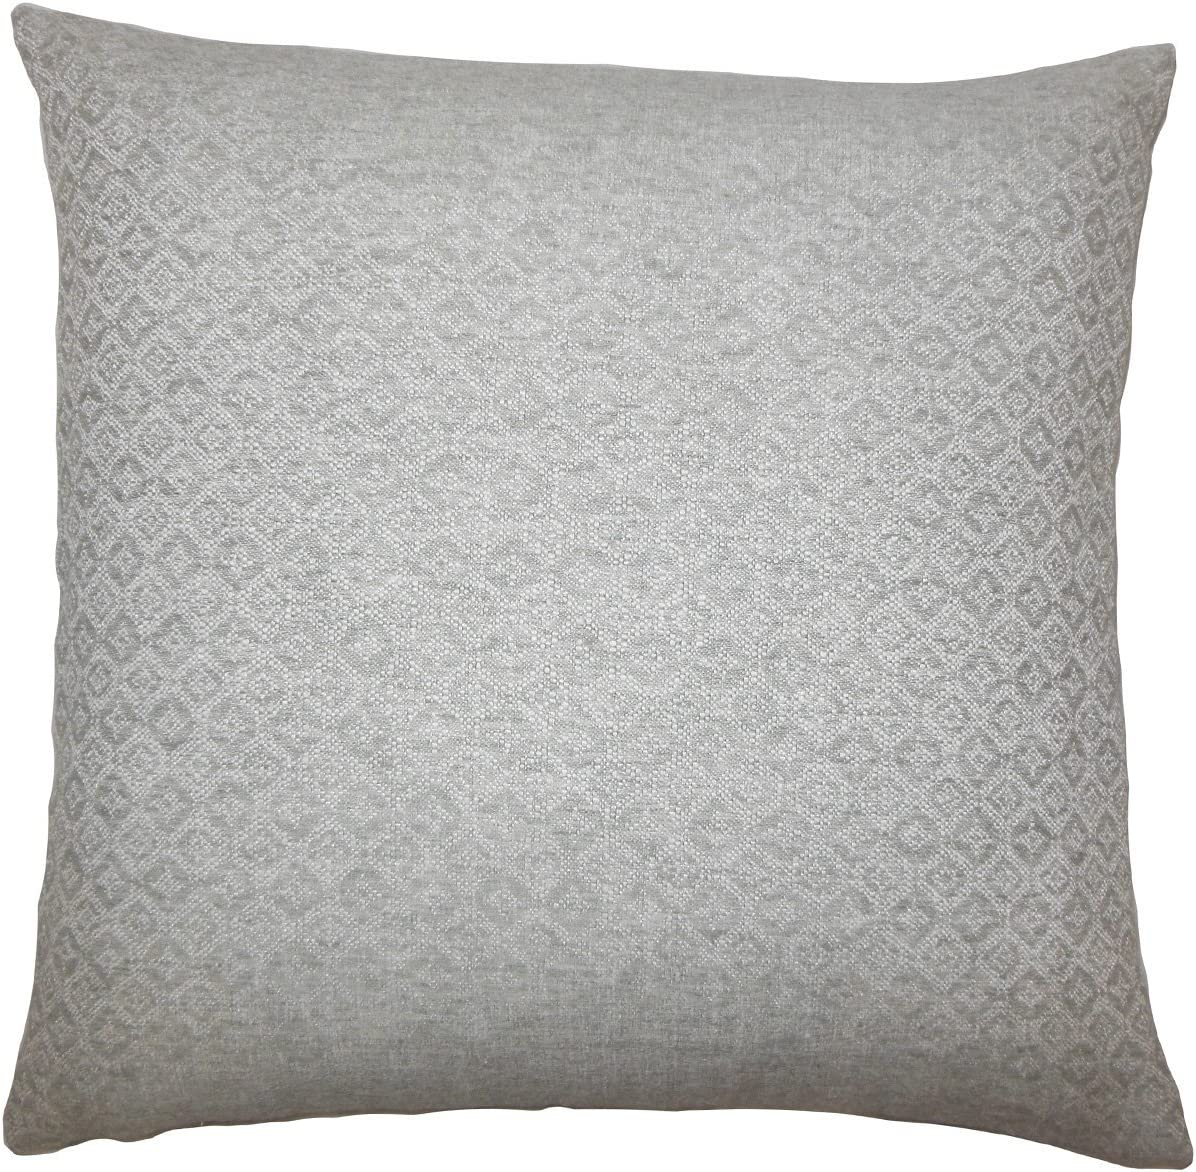 Standard//20 x 26 The Pillow Collection Caitir Geometric Bedding Sham Grey